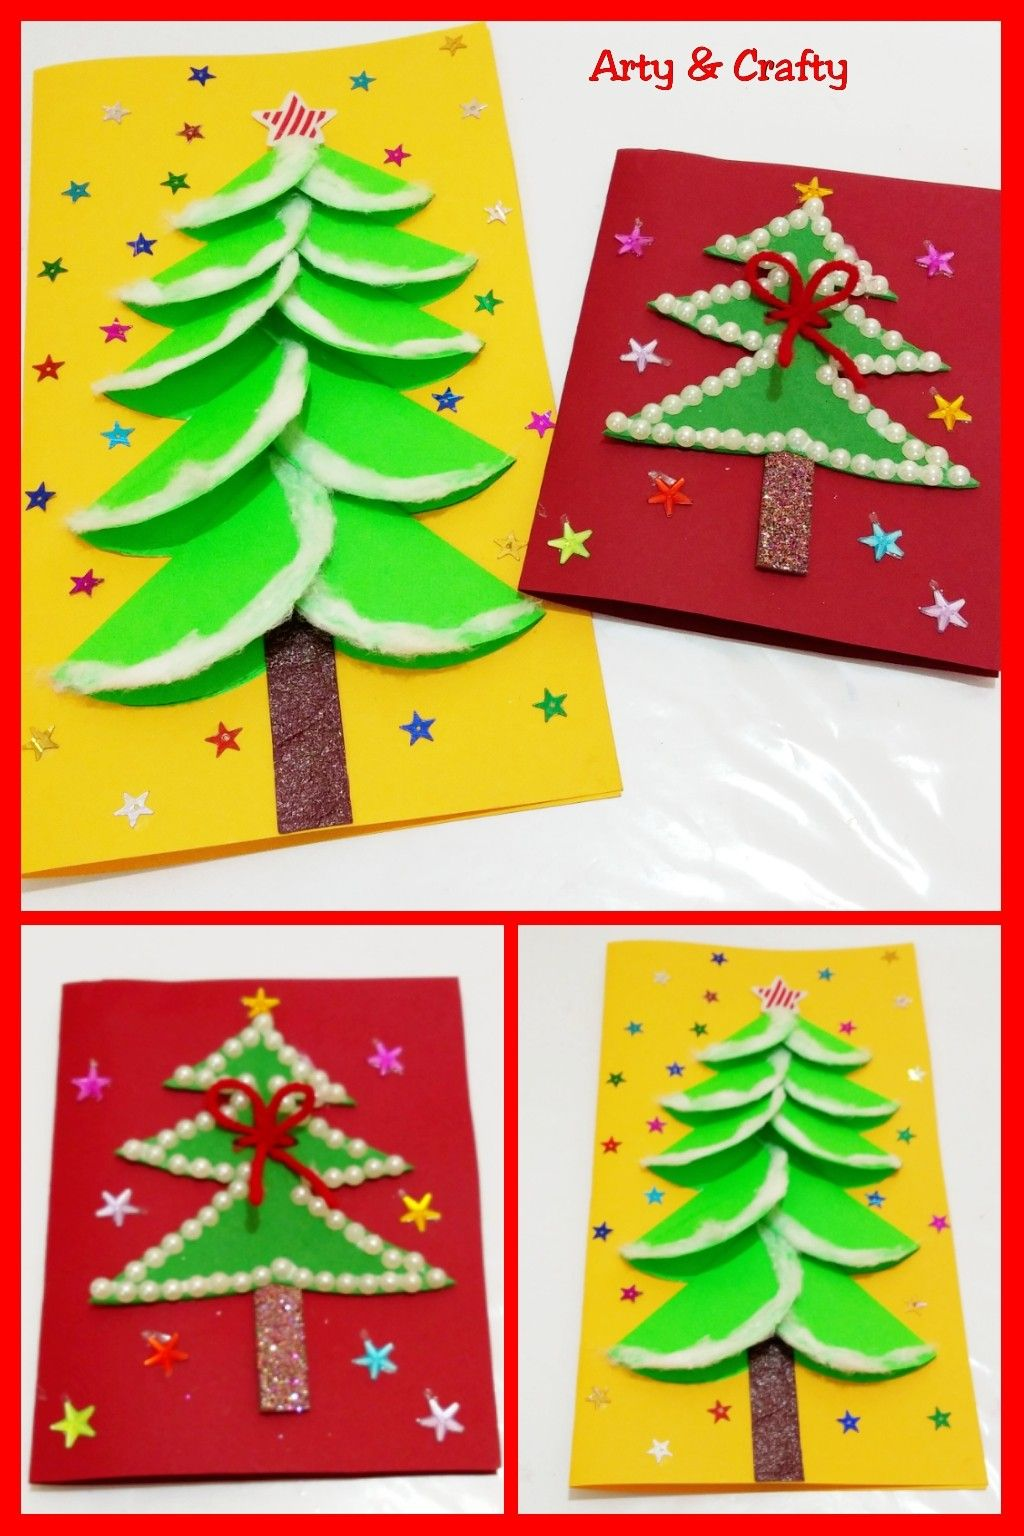 2 Diy Christmas Cards For Kids Easy Handmade Christmas Greeting Card Paper Ch Diy Christmas Cards Easy Christmas Greeting Cards Handmade Diy Christmas Cards